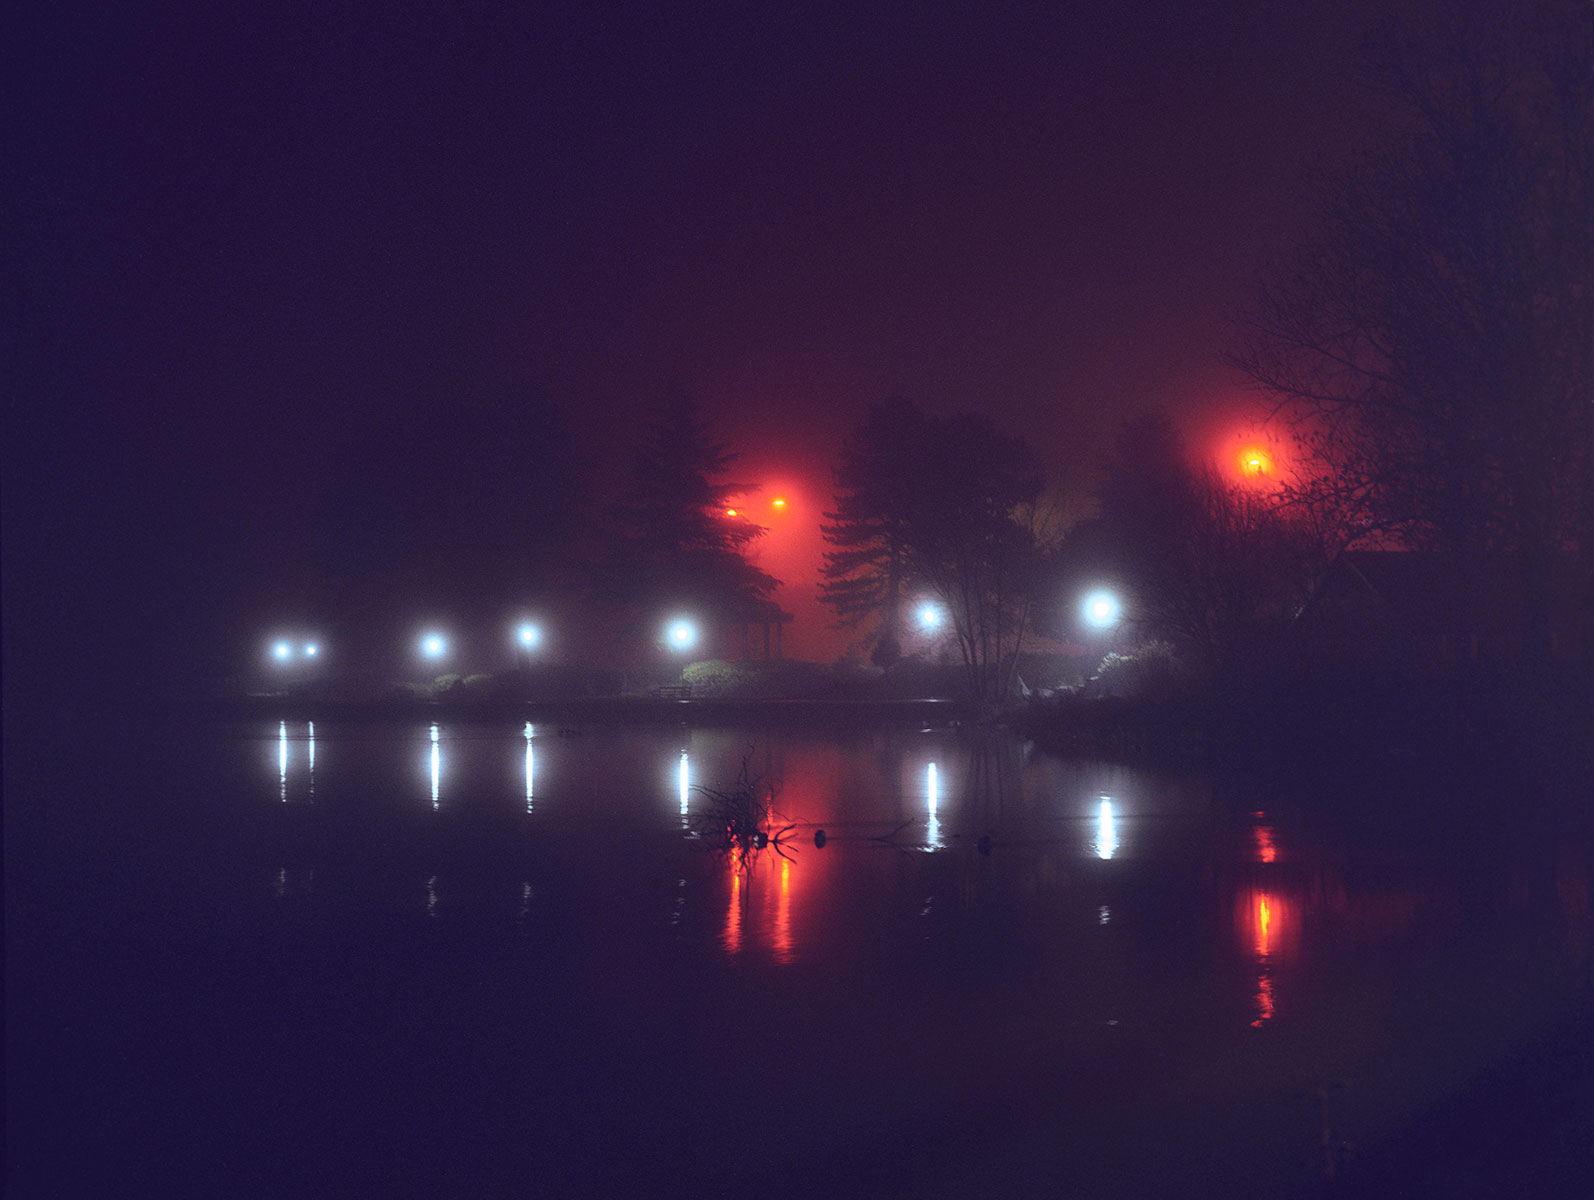 a misty night - c